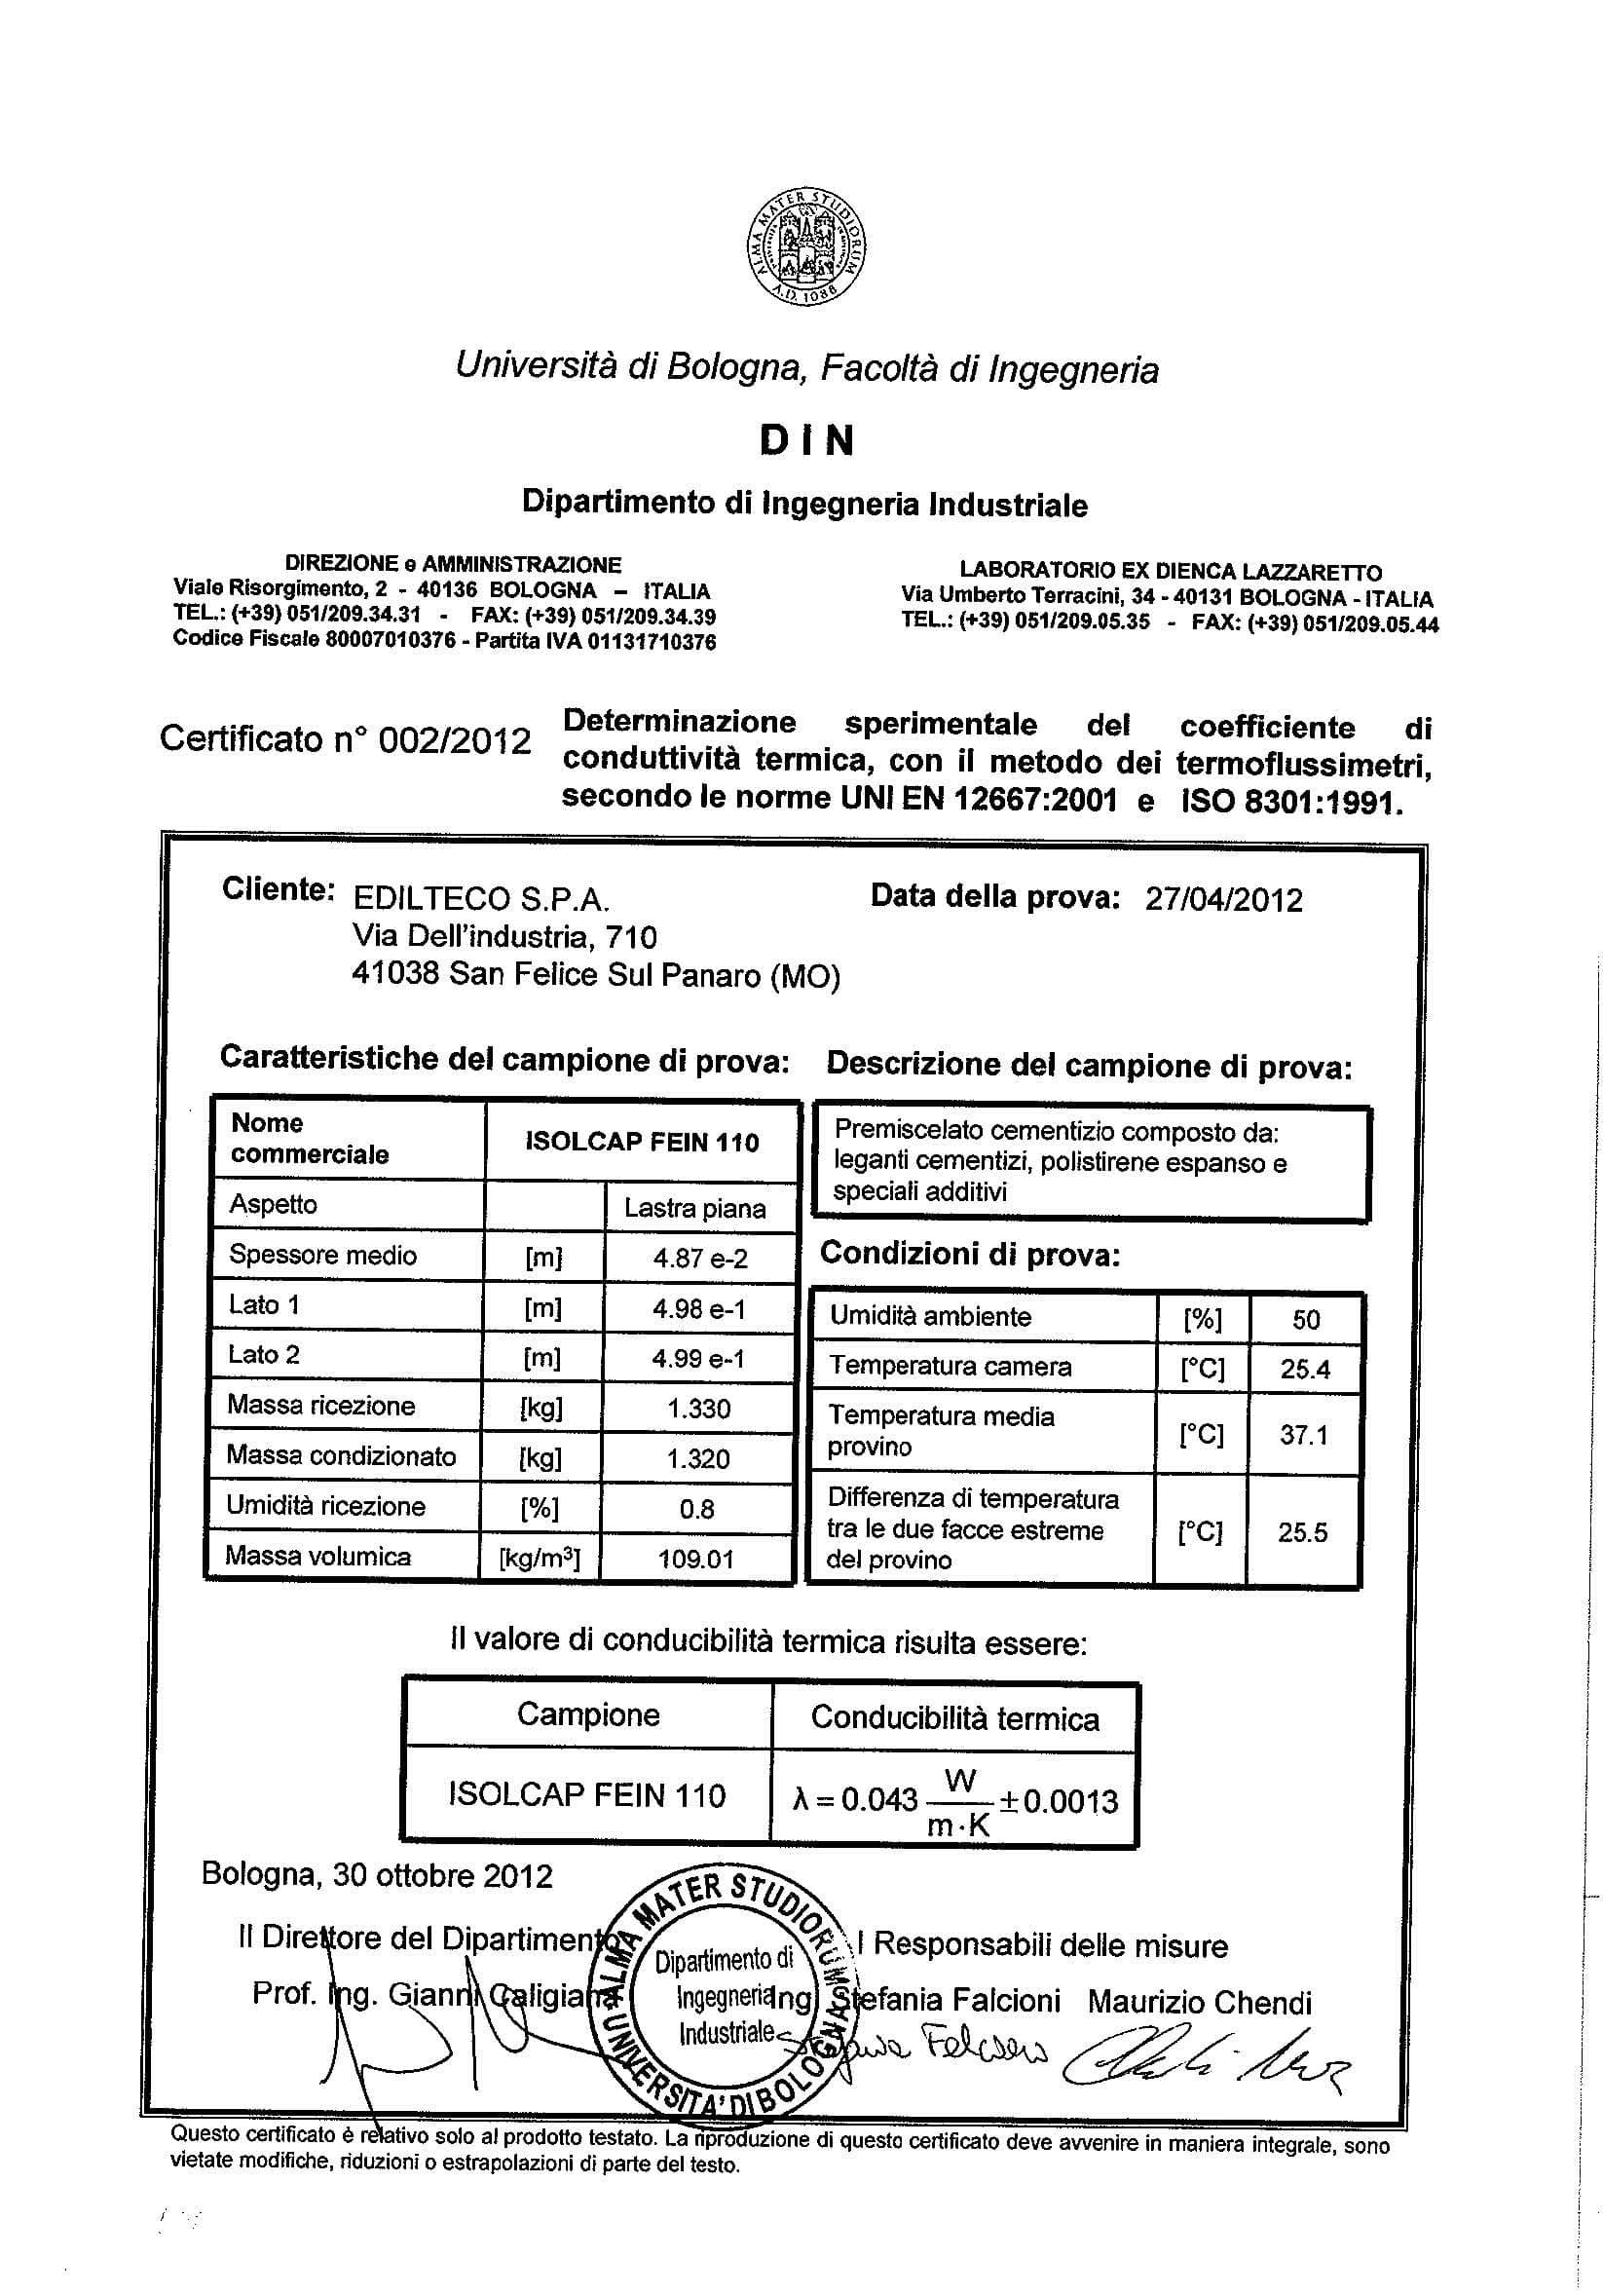 thermal-conductivity-Conducibilita_Isolcap-Light_27-04-12_0